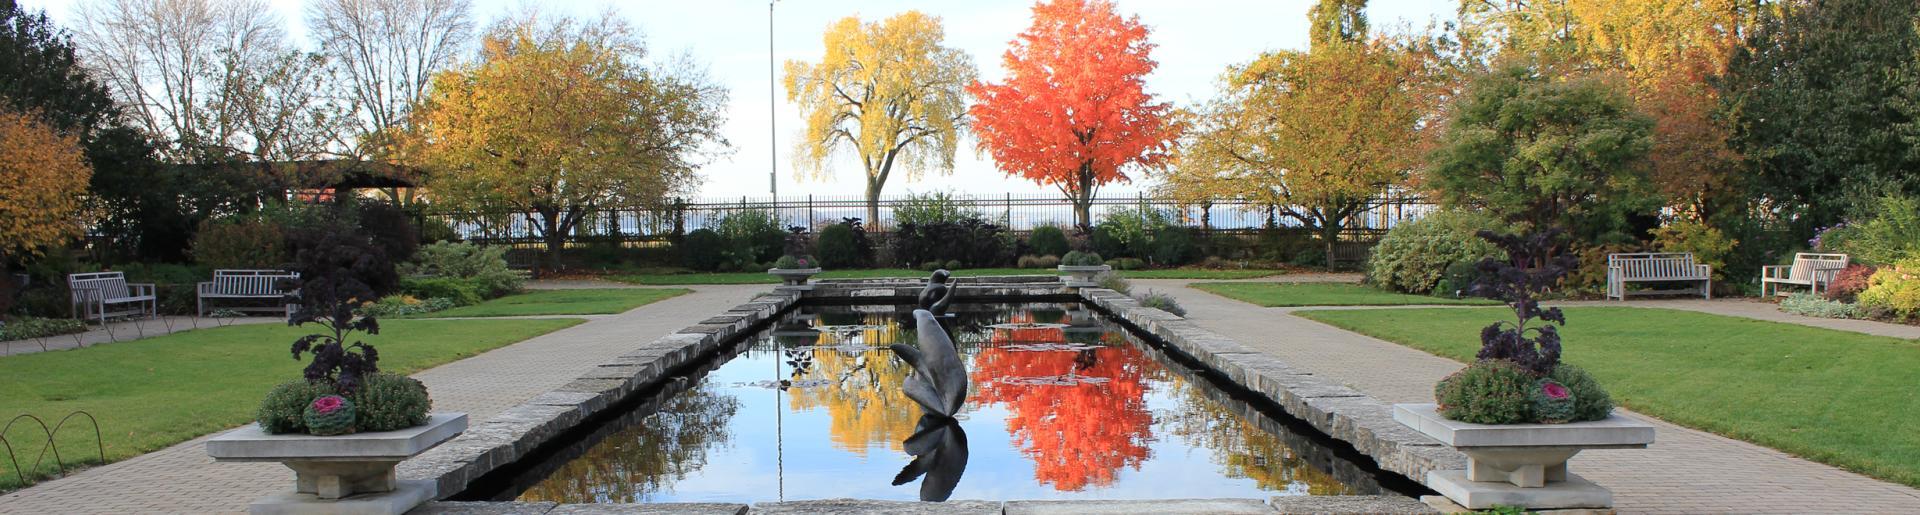 Olbrich Gardens Water Fountain